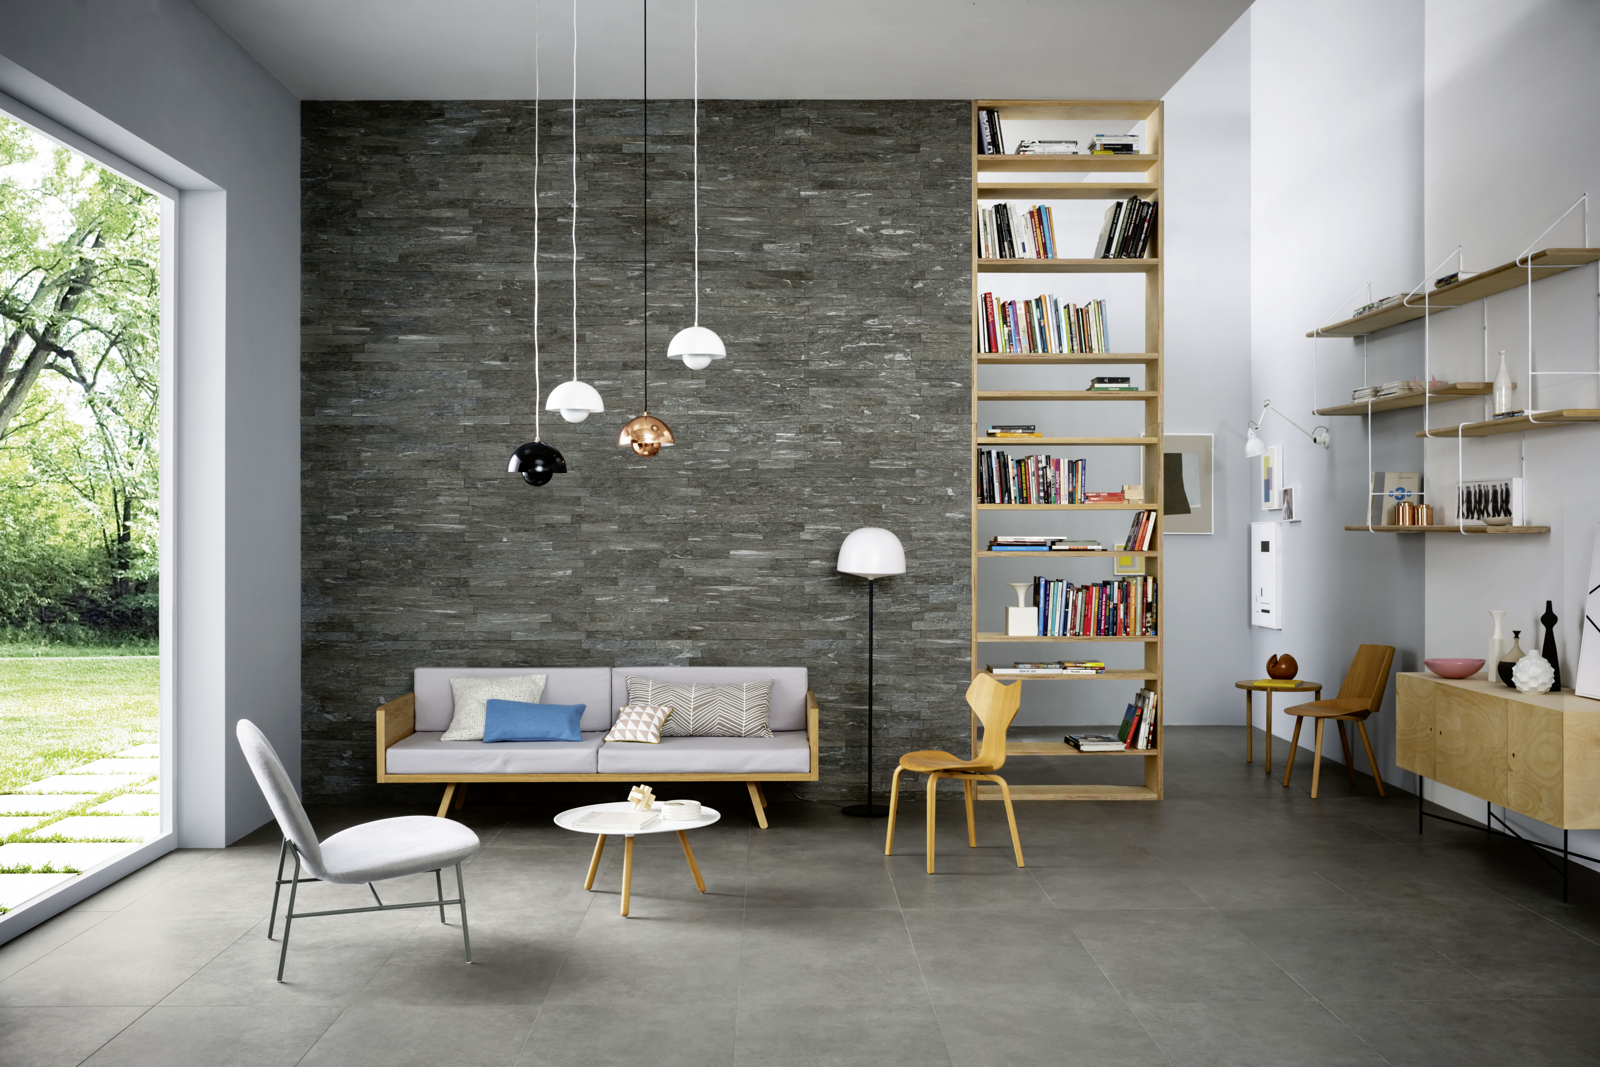 Pareti in pietra per interni minimal marazzi - Pietra per interni parete ...